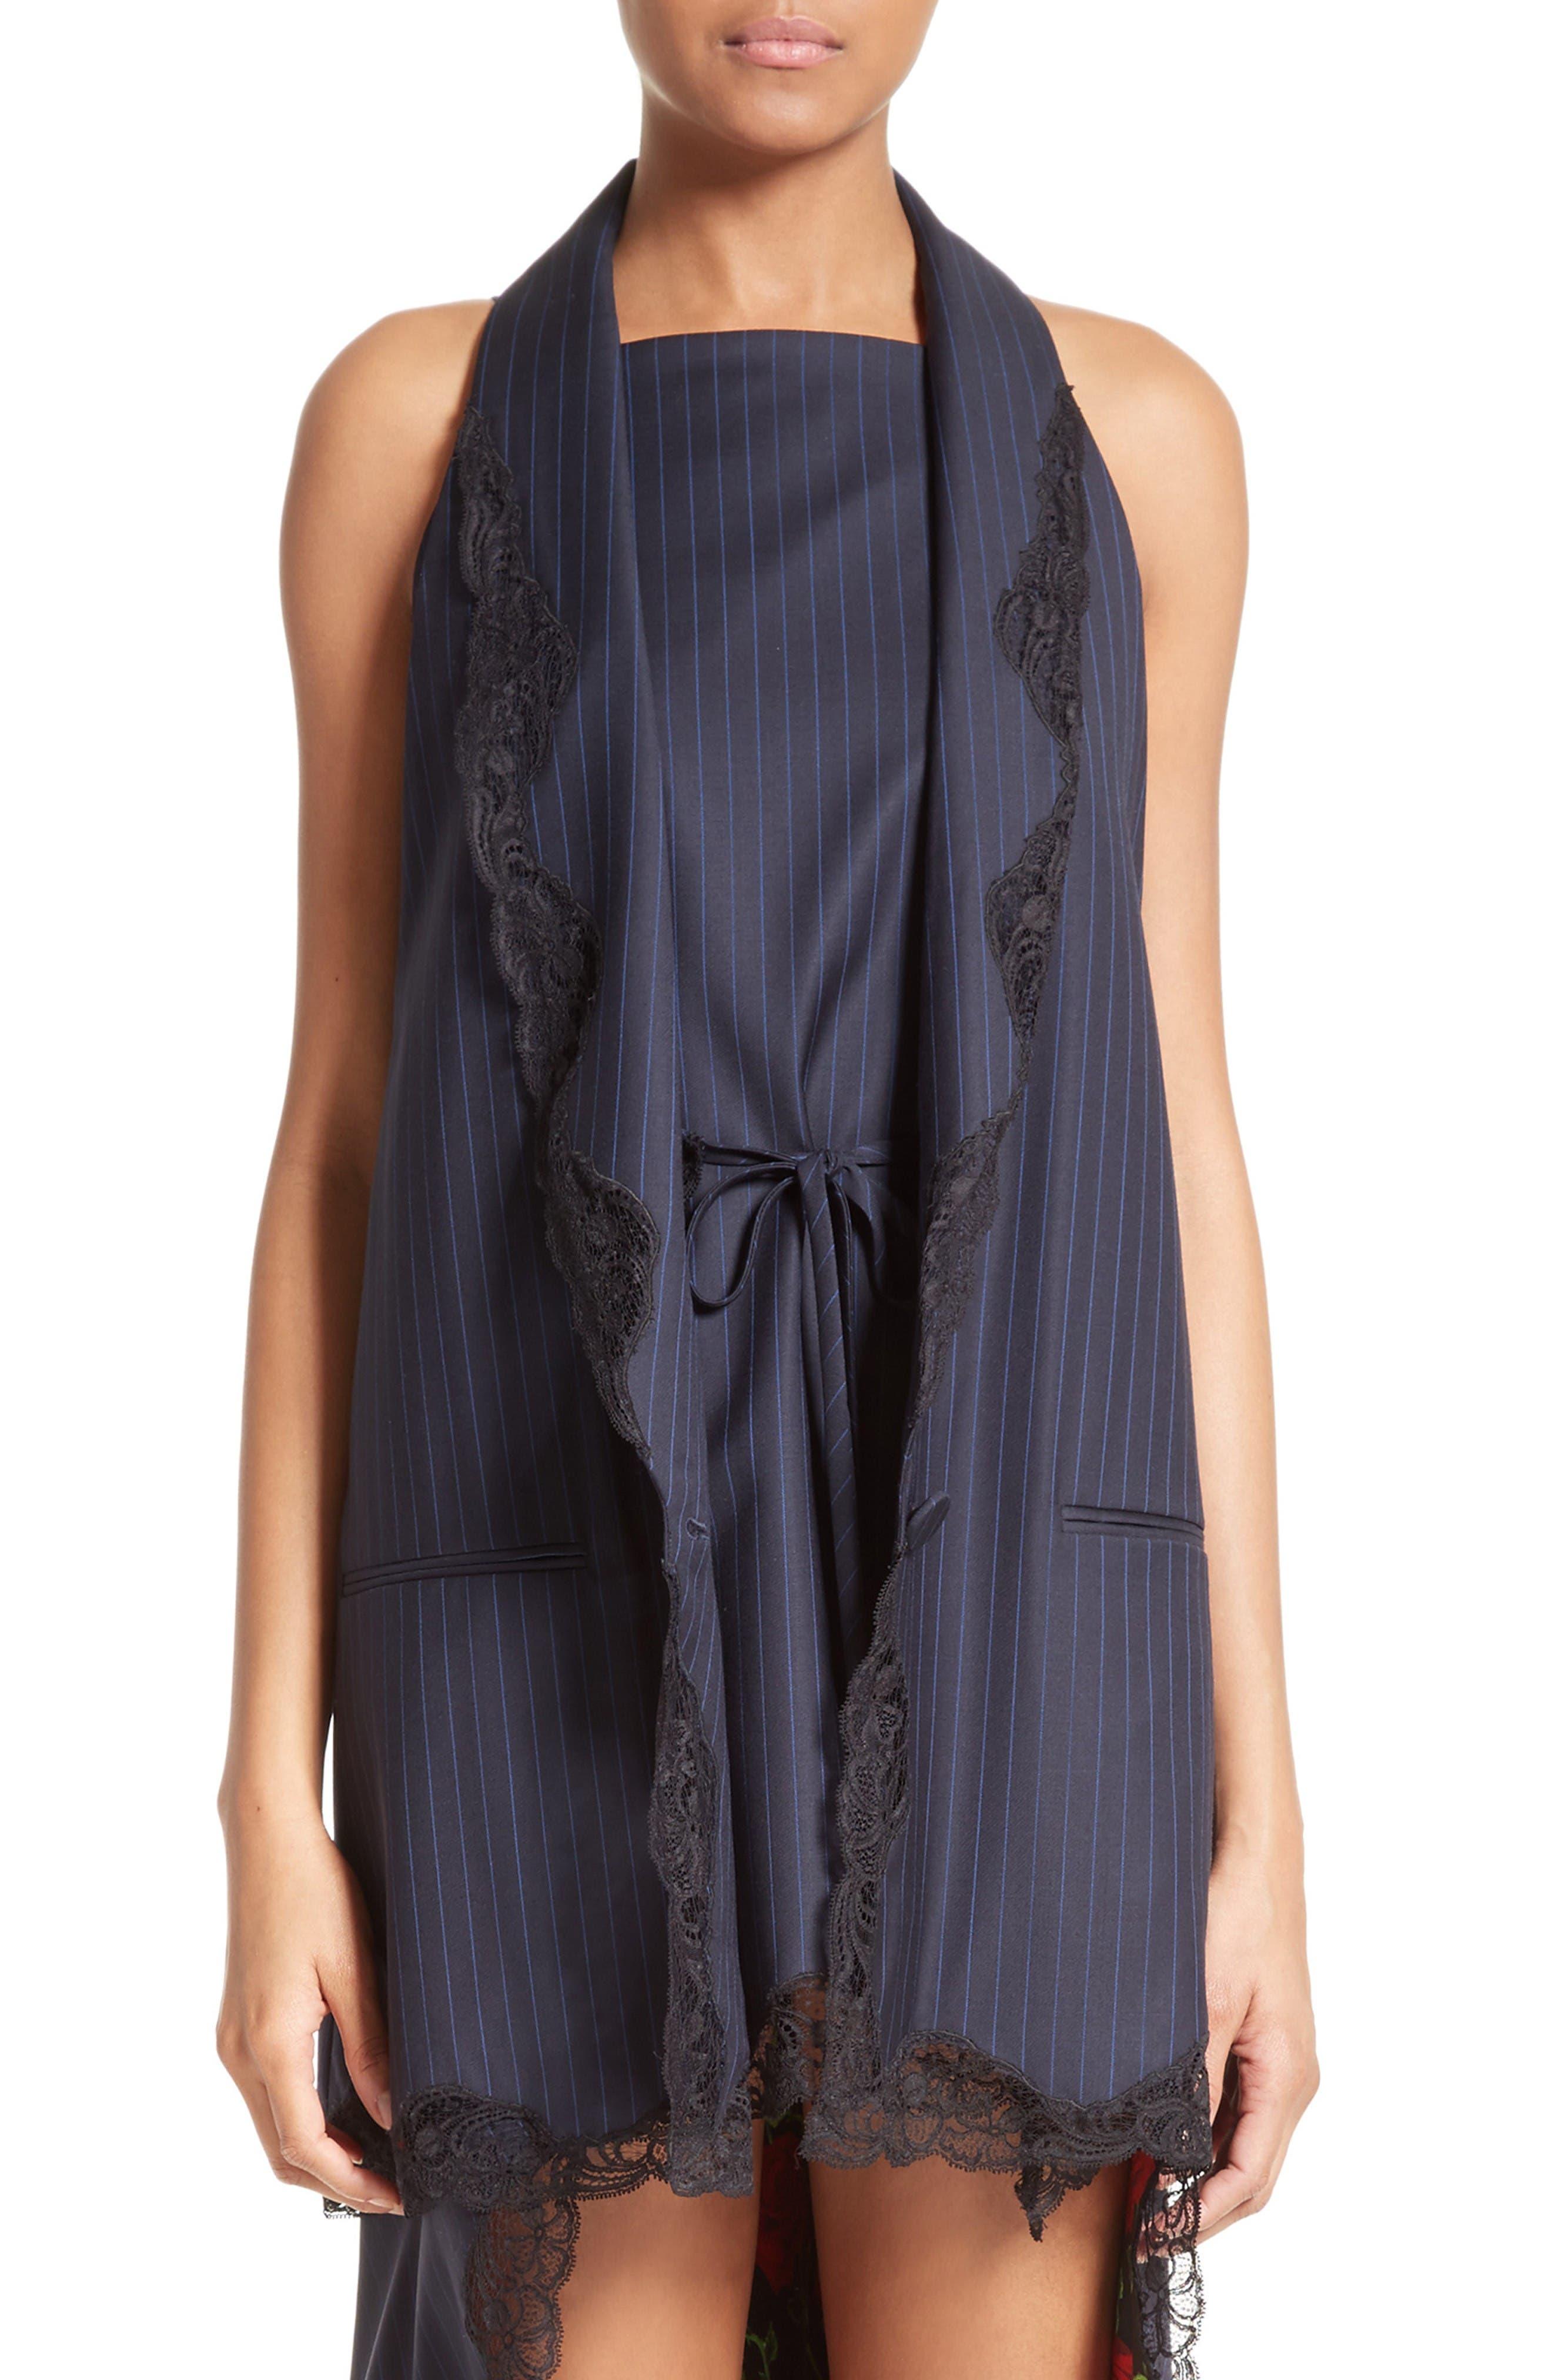 Alternate Image 1 Selected - Alexander Wang Lace Trim Pinstripe Vest